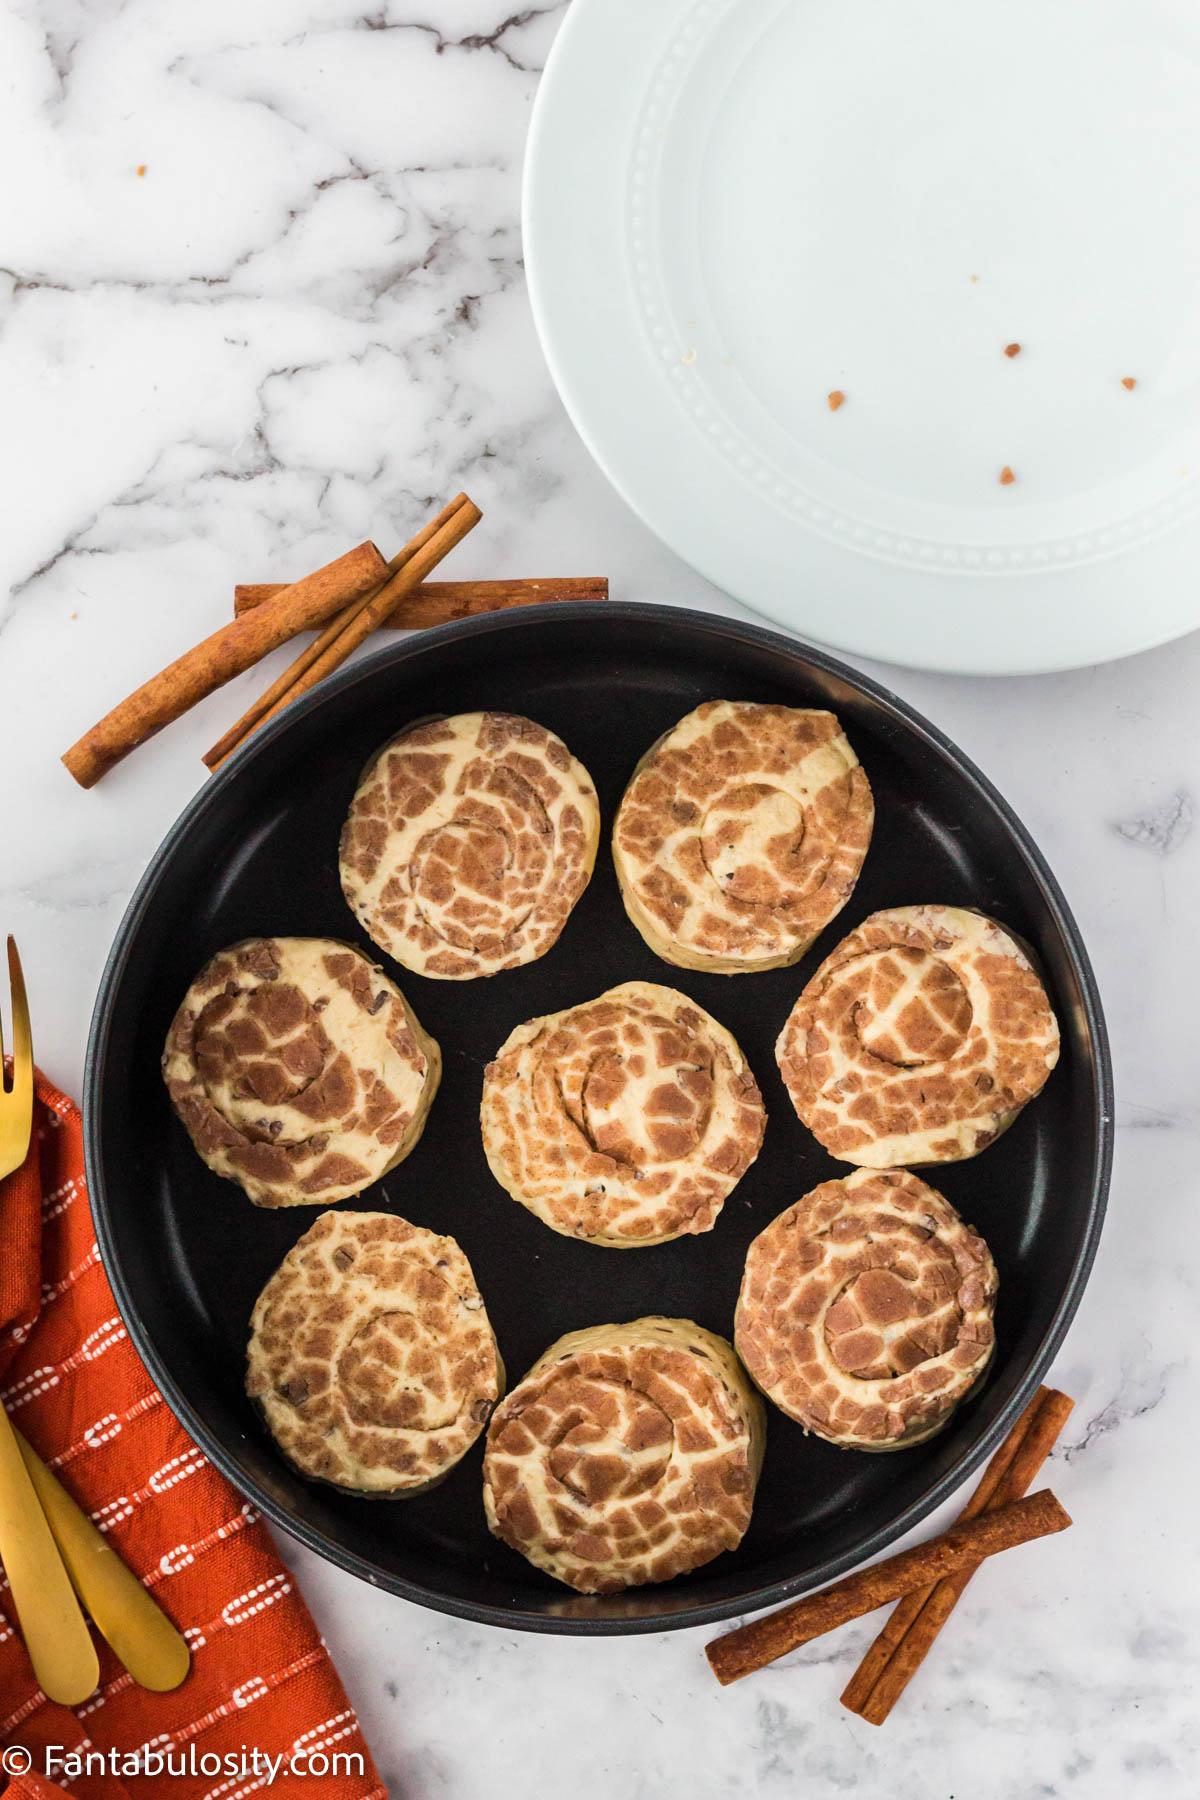 raw pillsbury cinnamon rolls in air fryer basket